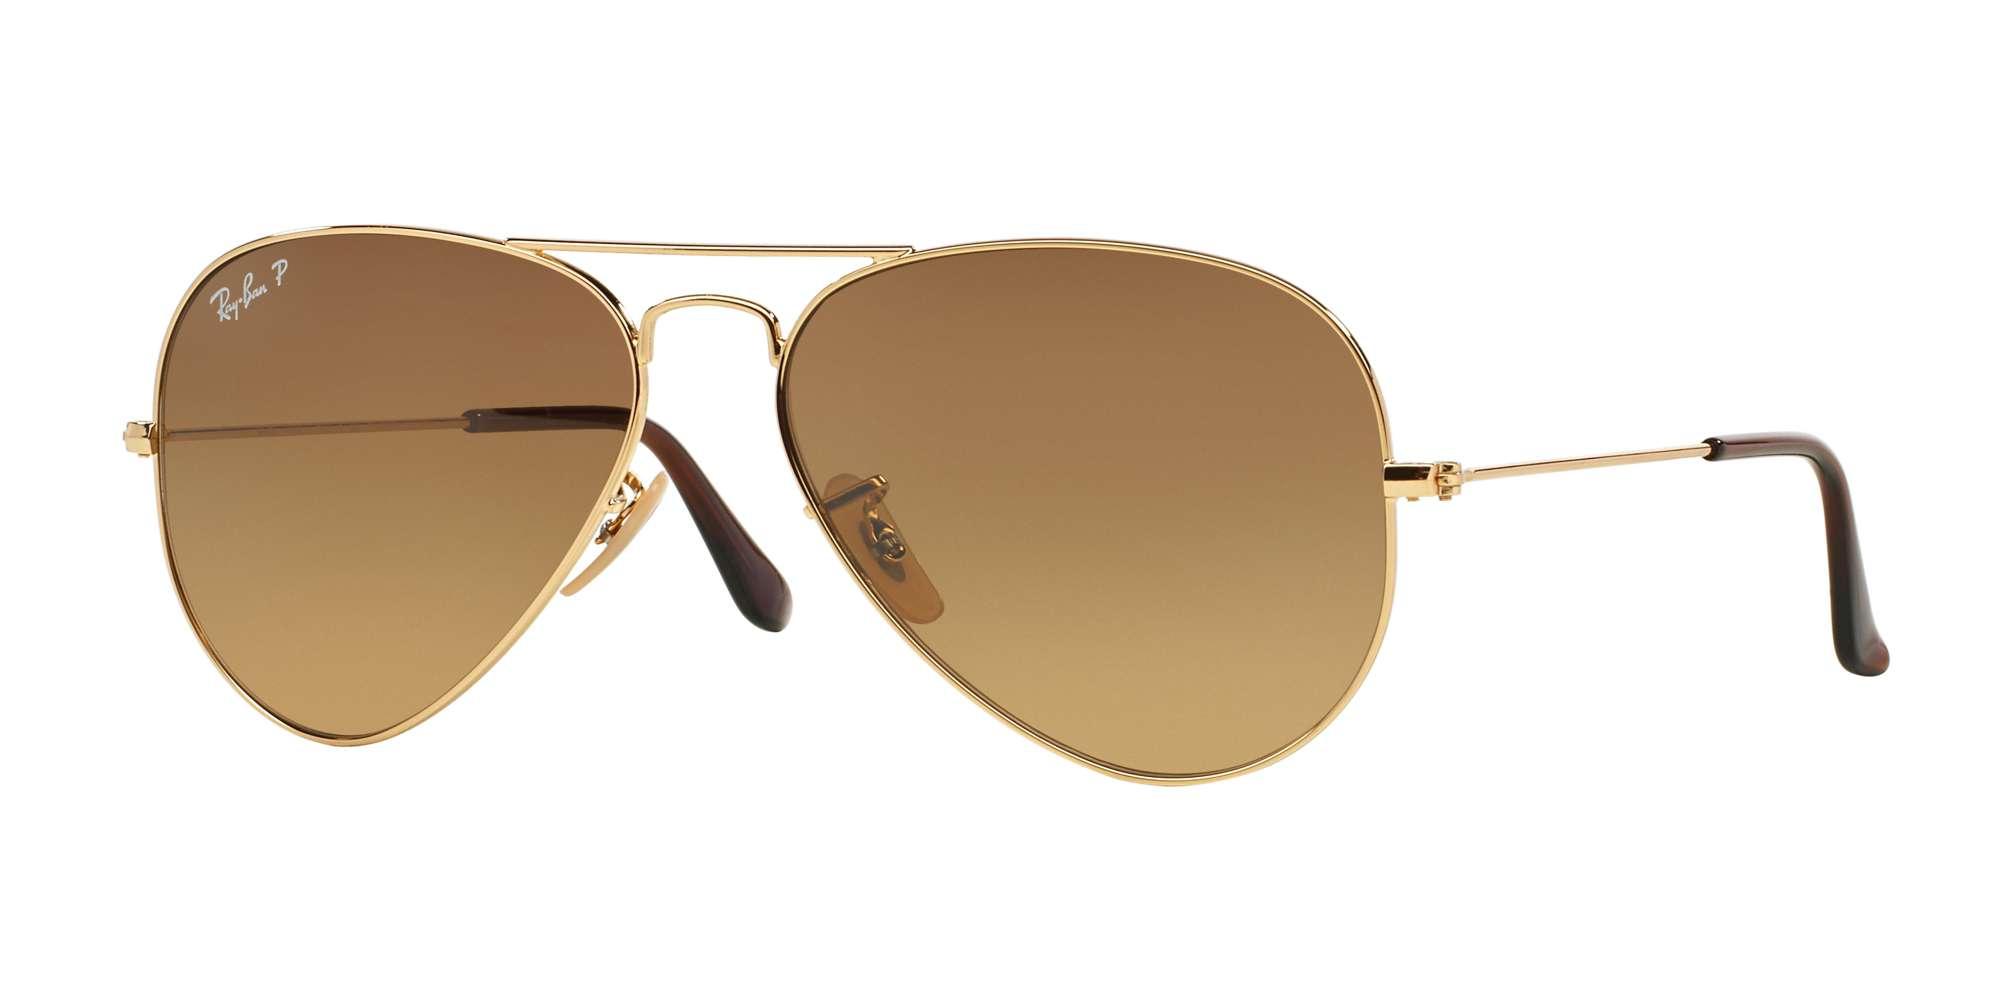 SHINY GOLD / CRYSTAL POLAR BROWN GRADIENT lenses